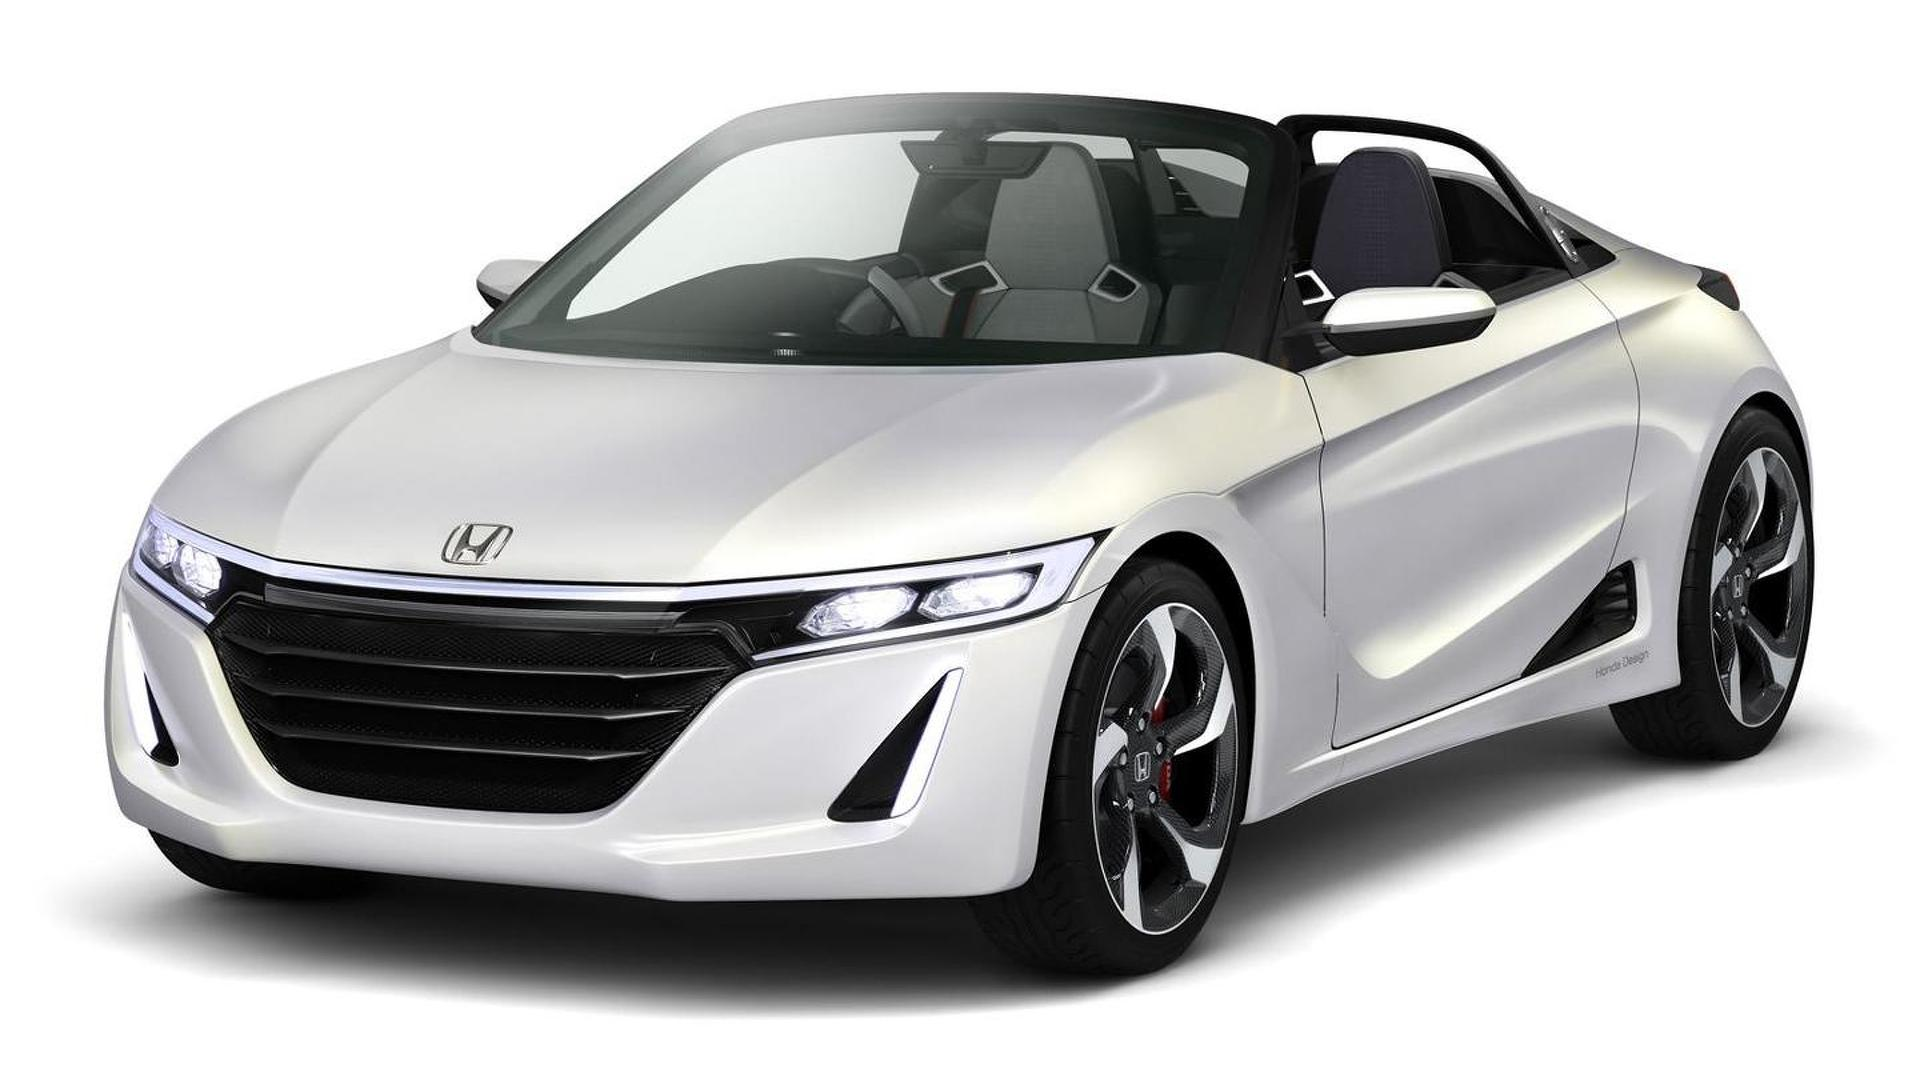 Honda S660 concept previewed ahead of Tokyo debut